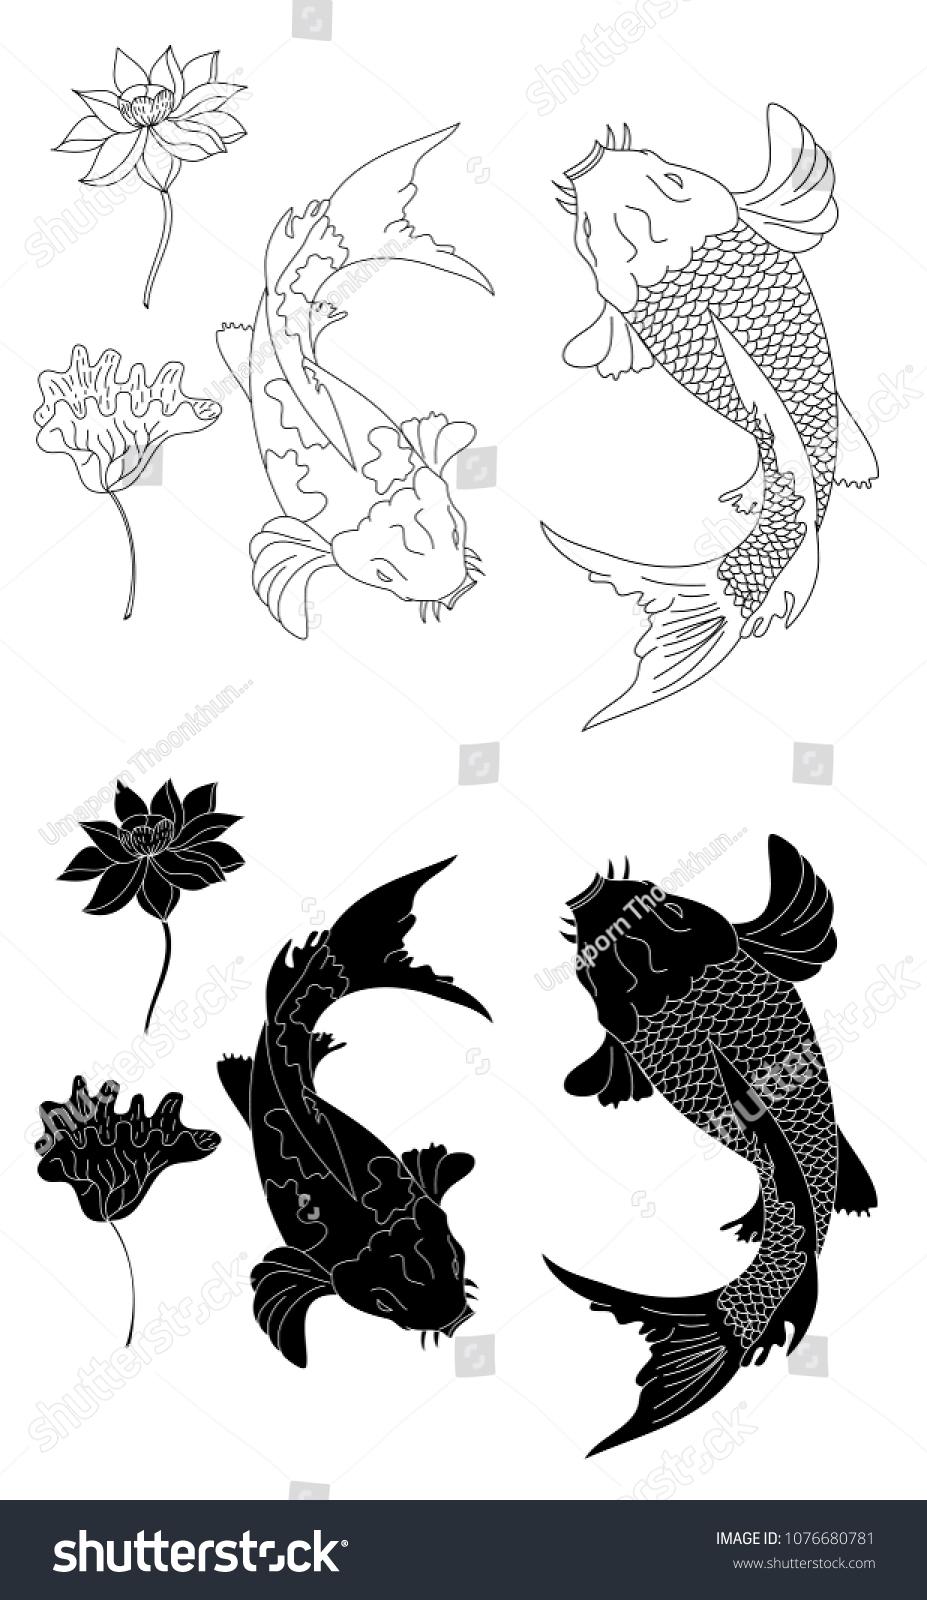 Gold koi fish lotus flower tattoo stock vector royalty free gold koi fish and lotus flower for tattoo designinese koi carp isolate vector izmirmasajfo